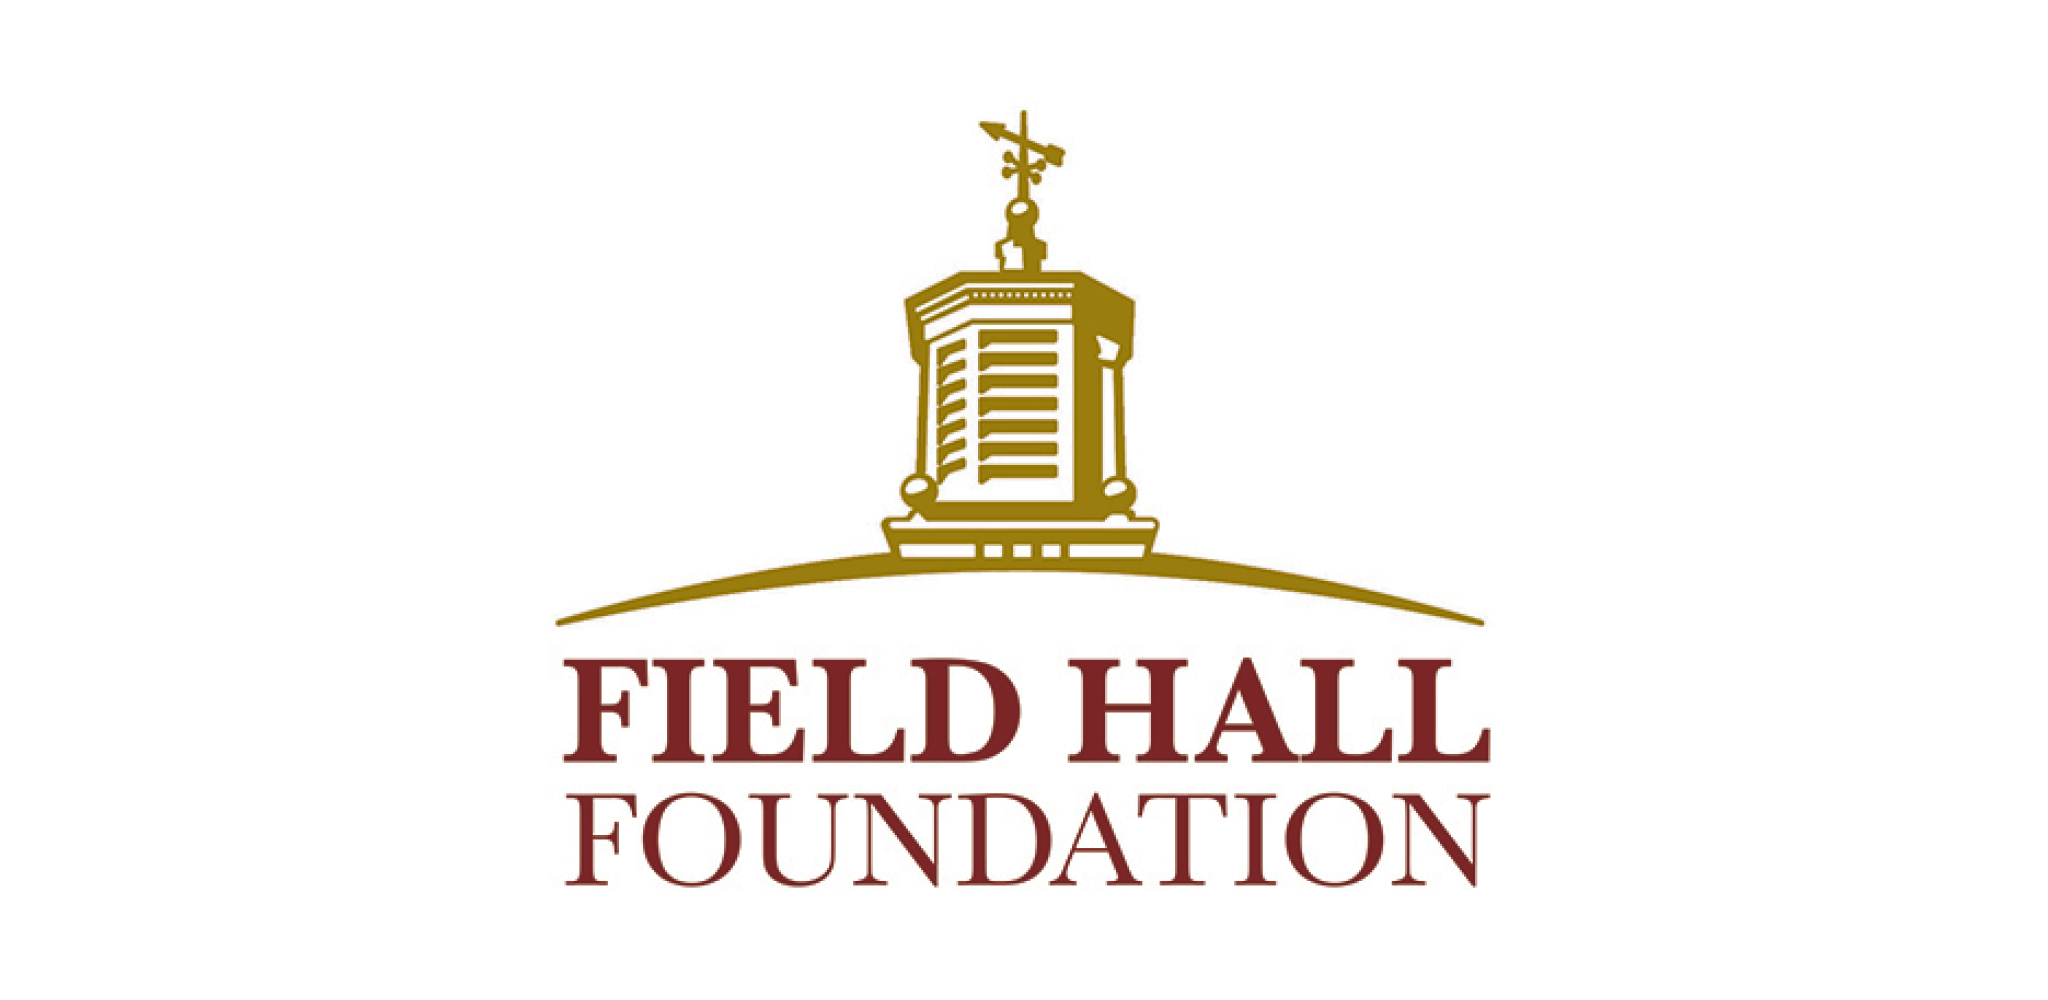 The Field Hall Foundation, Logo